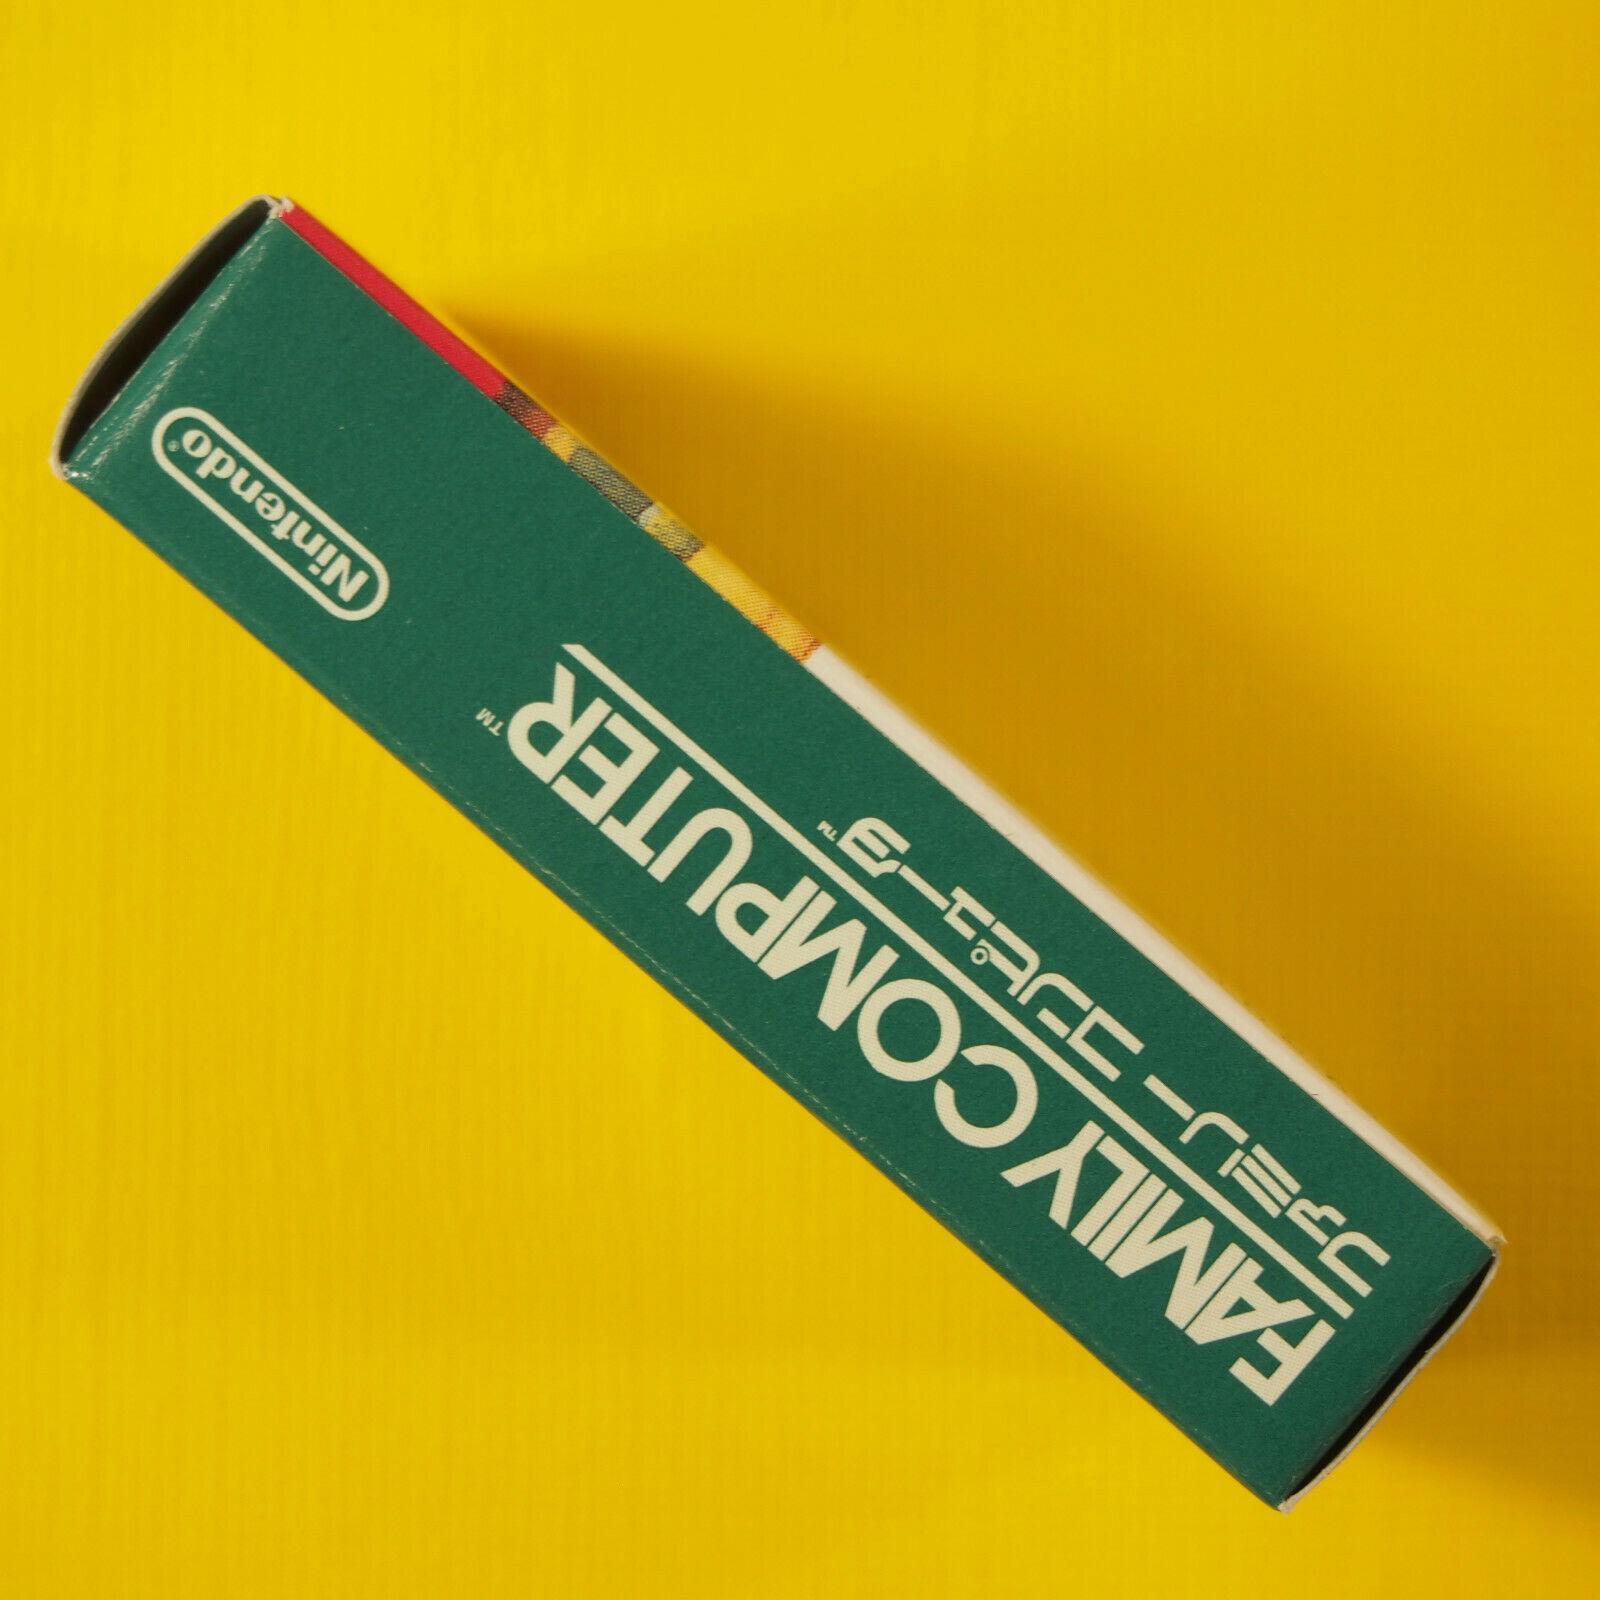 Legend of Zelda: Famicom Mini Complete (Nintendo Gameboy Advance GBA 2004) Japan image 7